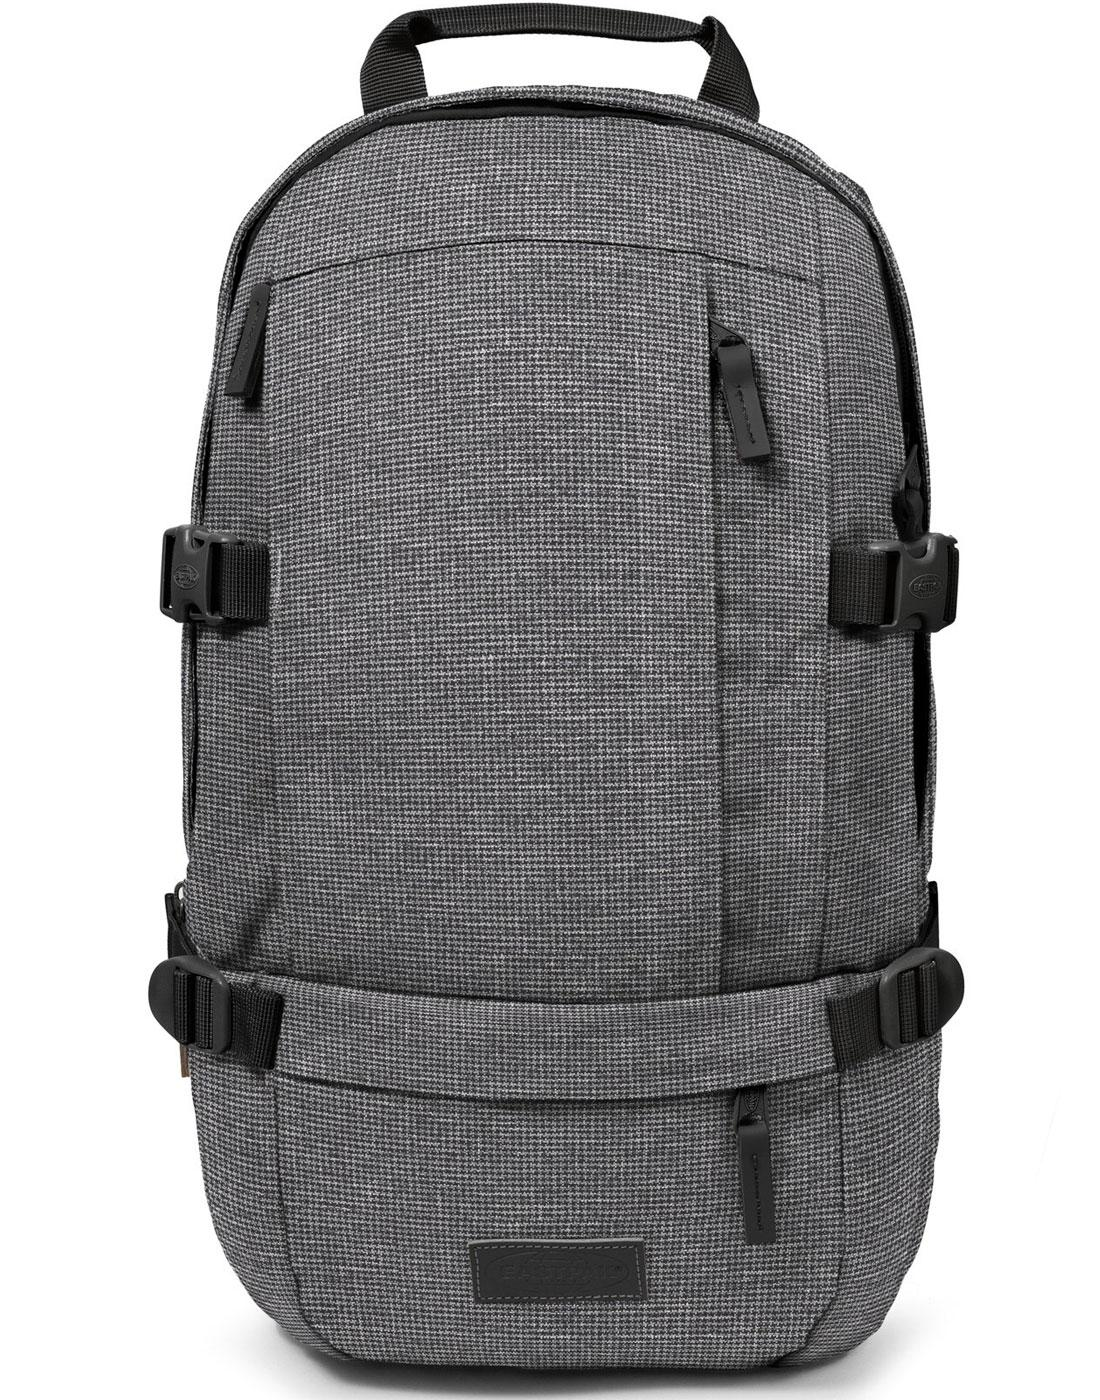 Floid EASTPAK Ash Blend Ergonomic Laptop Backpack